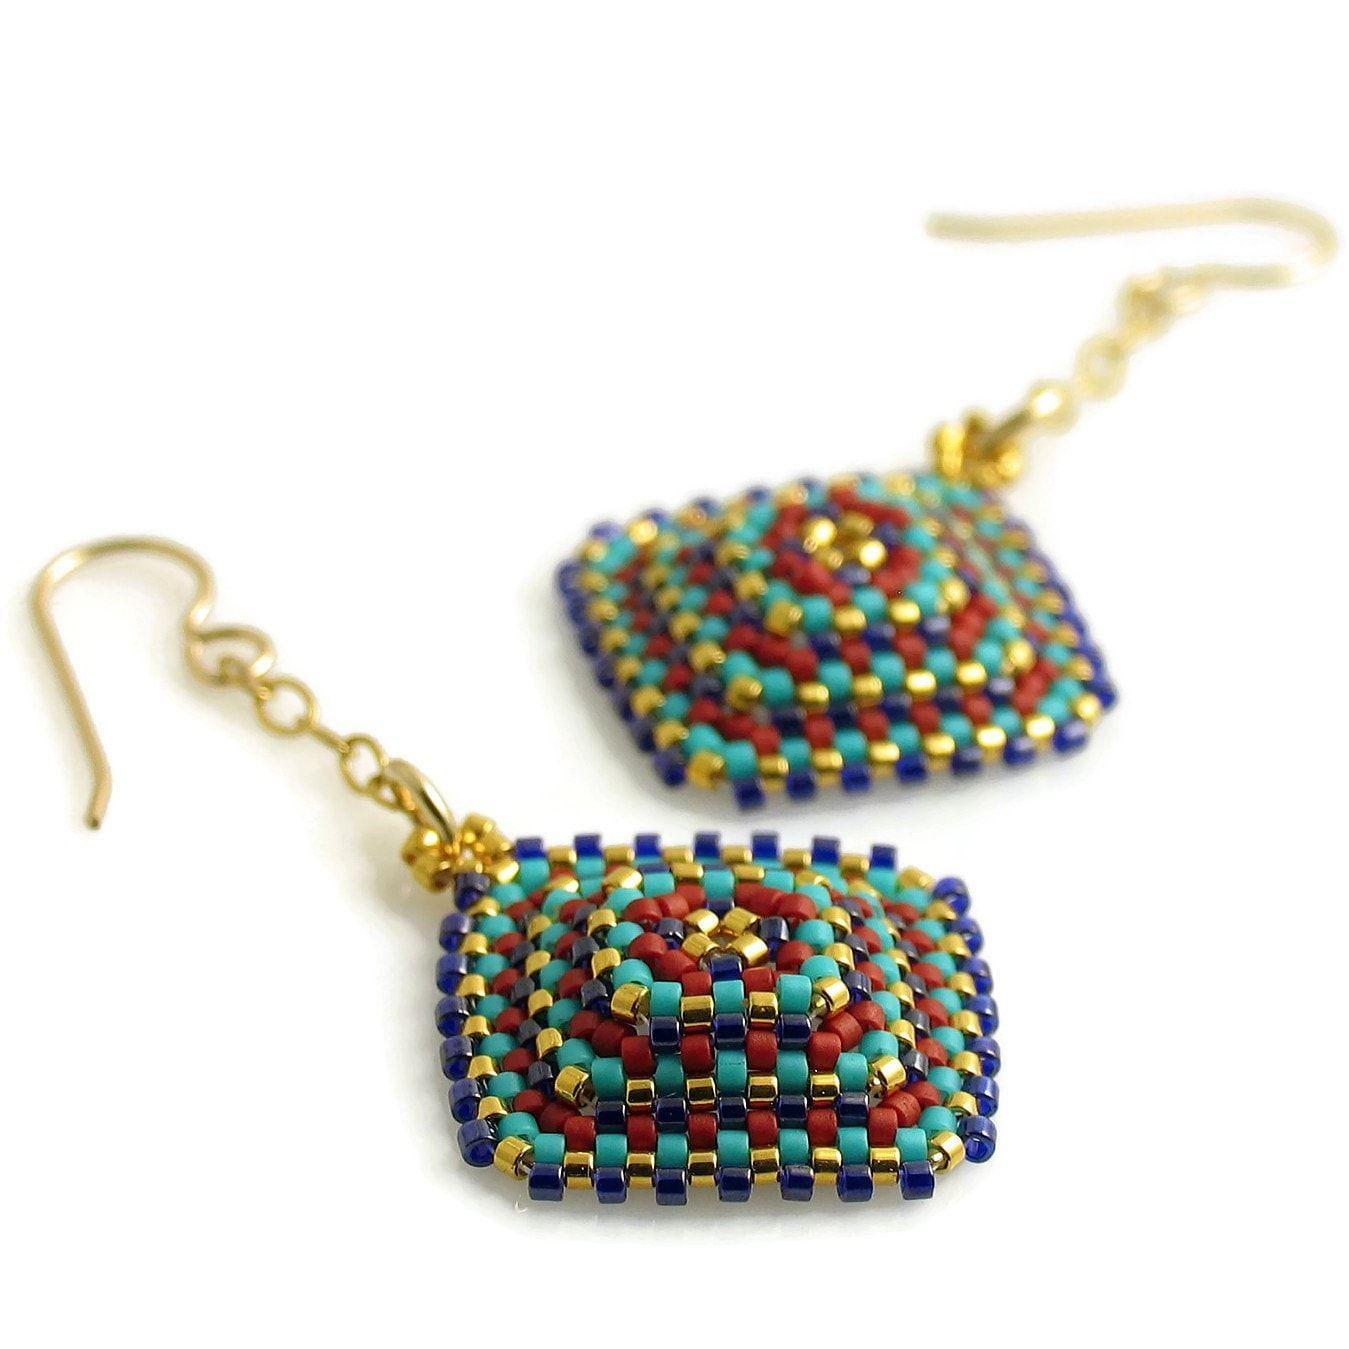 Delight & Joy Textured Square Earrings